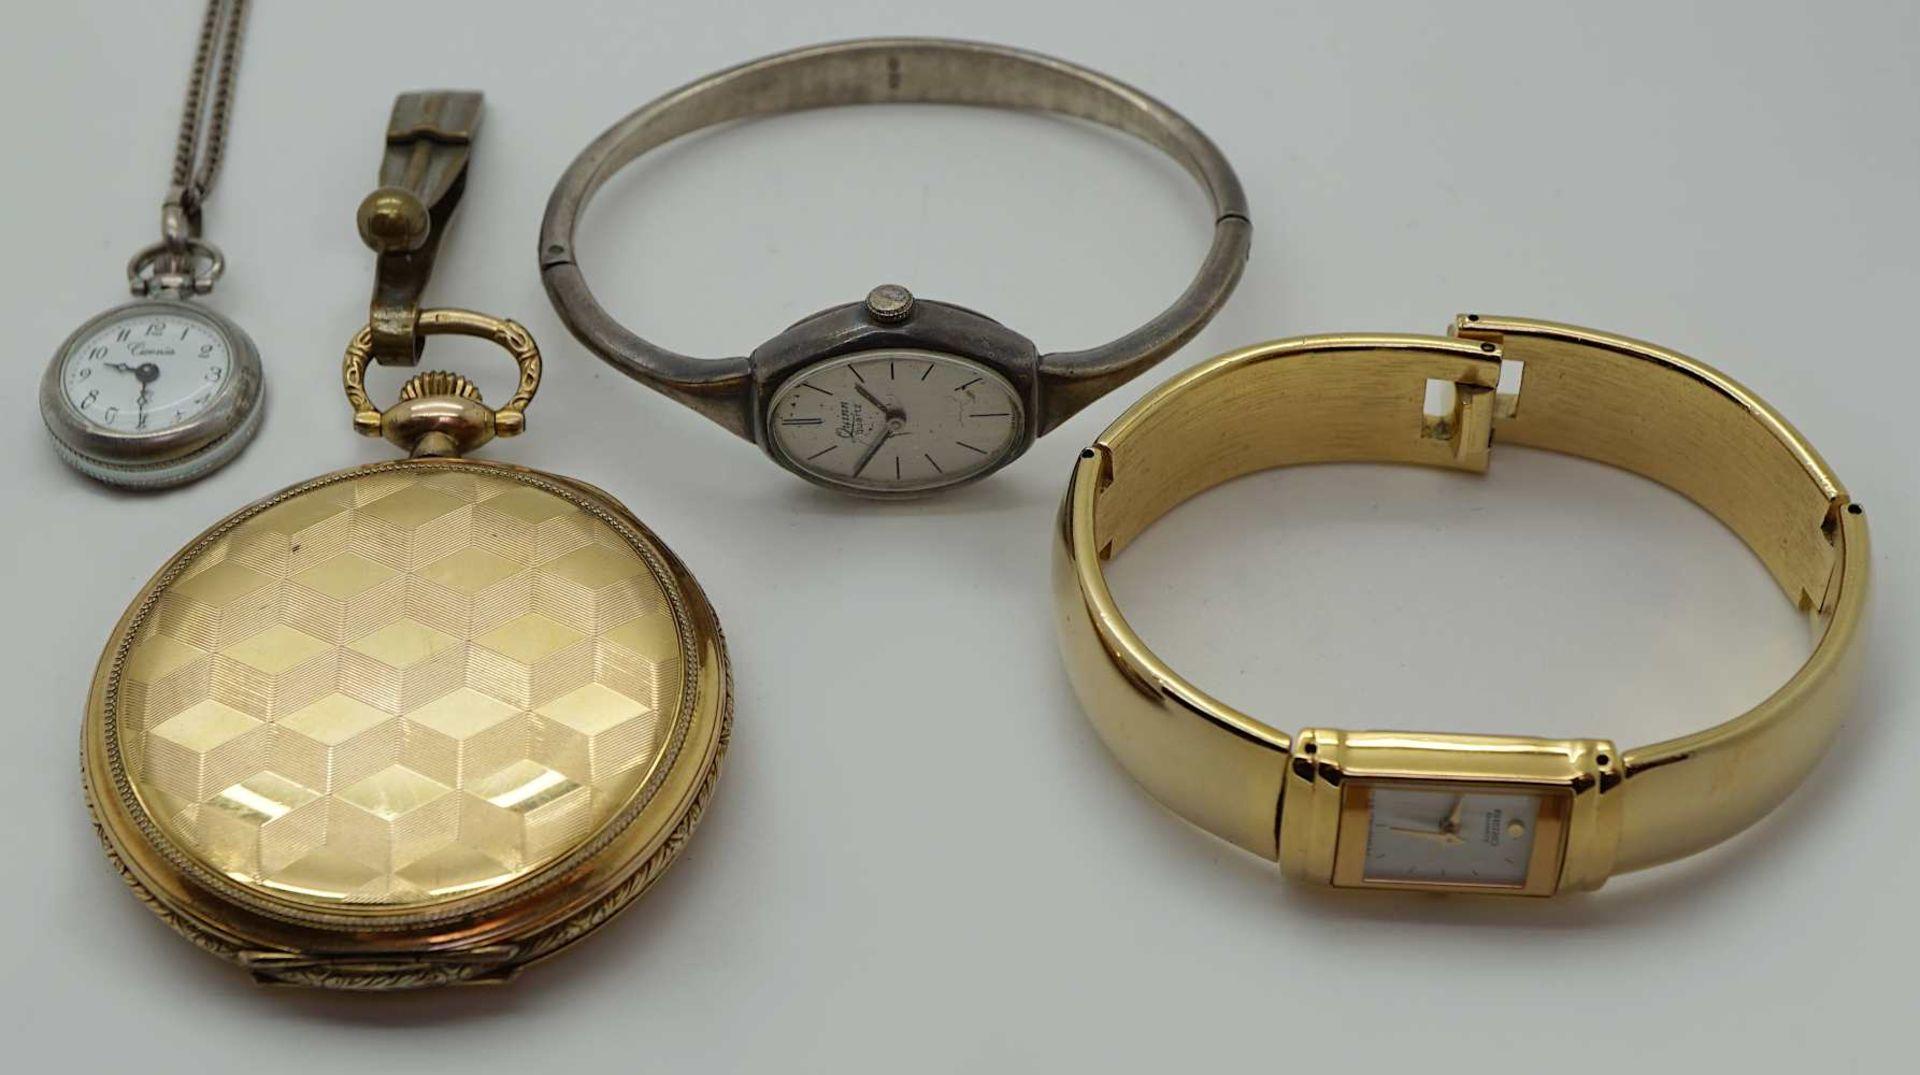 1 Armbanduhr Si. 925 QUINN Quarz sowie 3 Uhren z.T. Metall verg. Gsp.